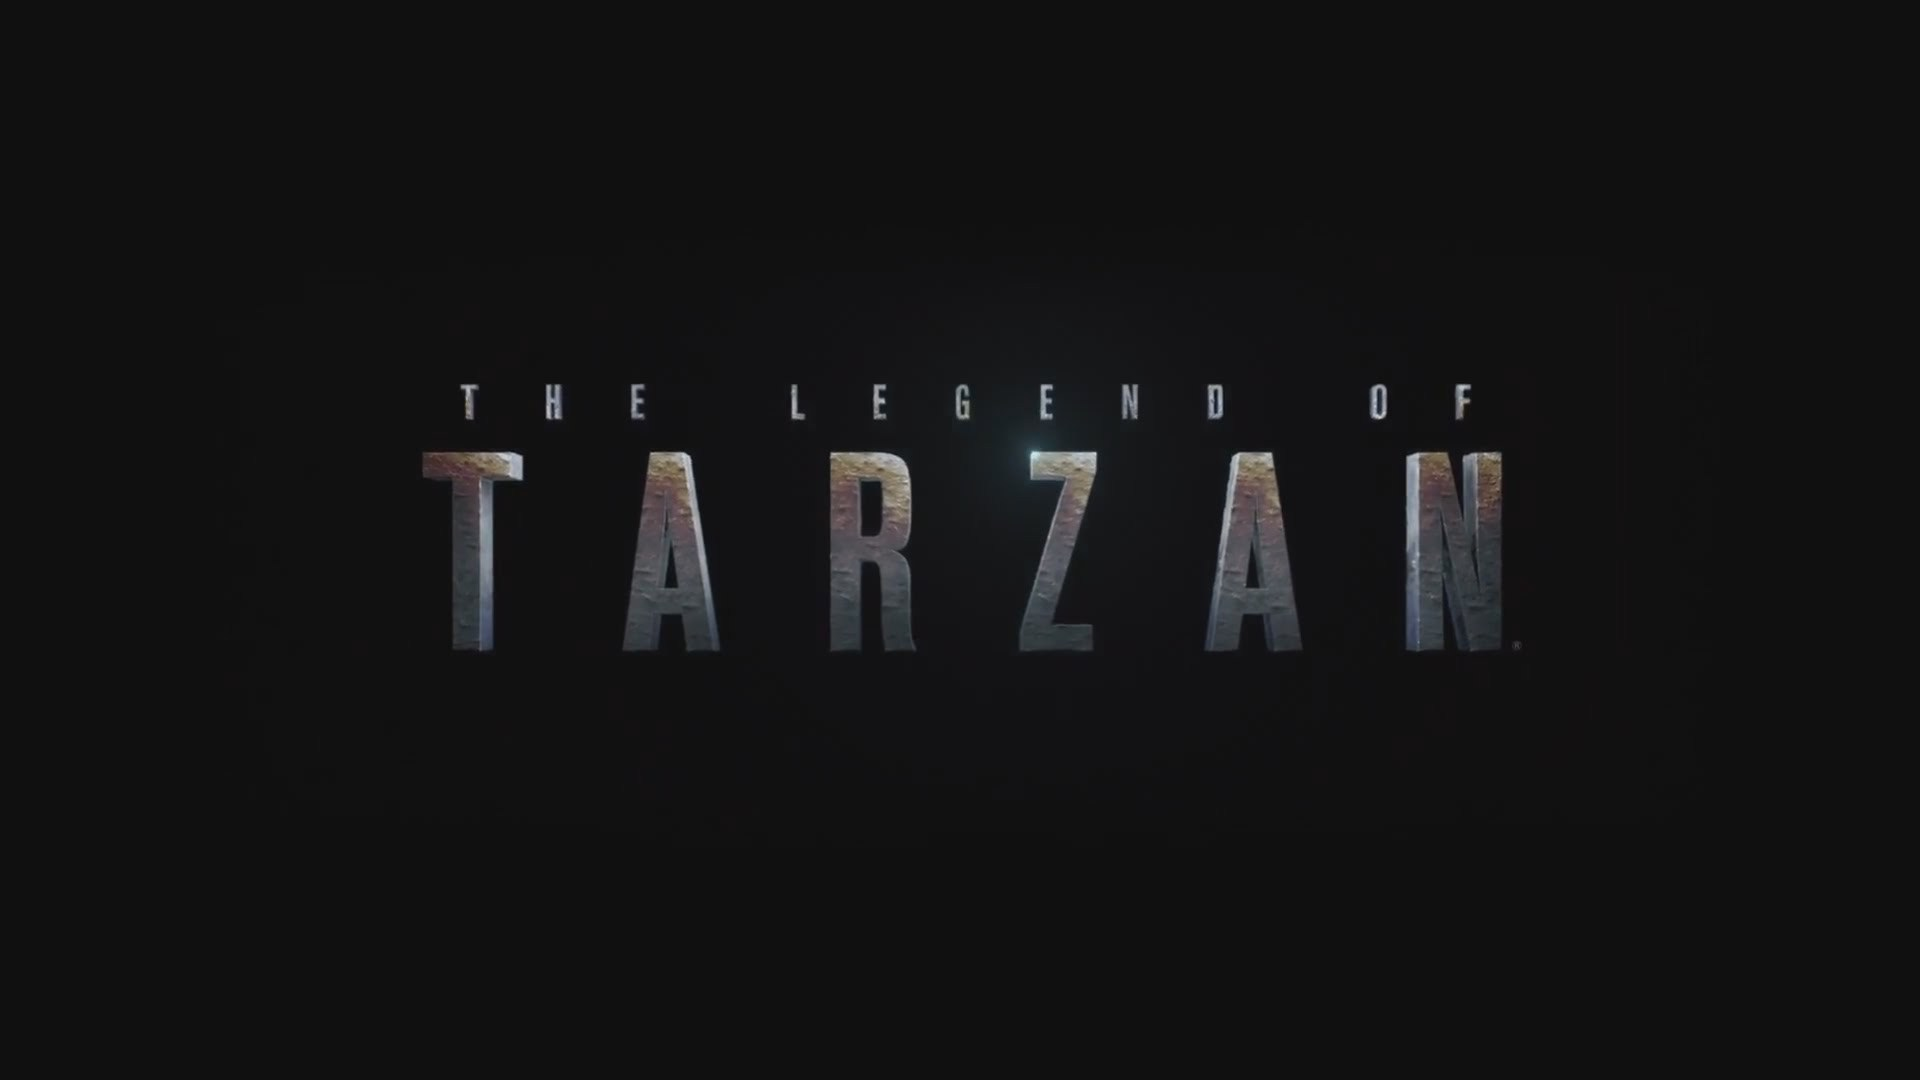 The Legend Of Tarzan Computer Wallpaper